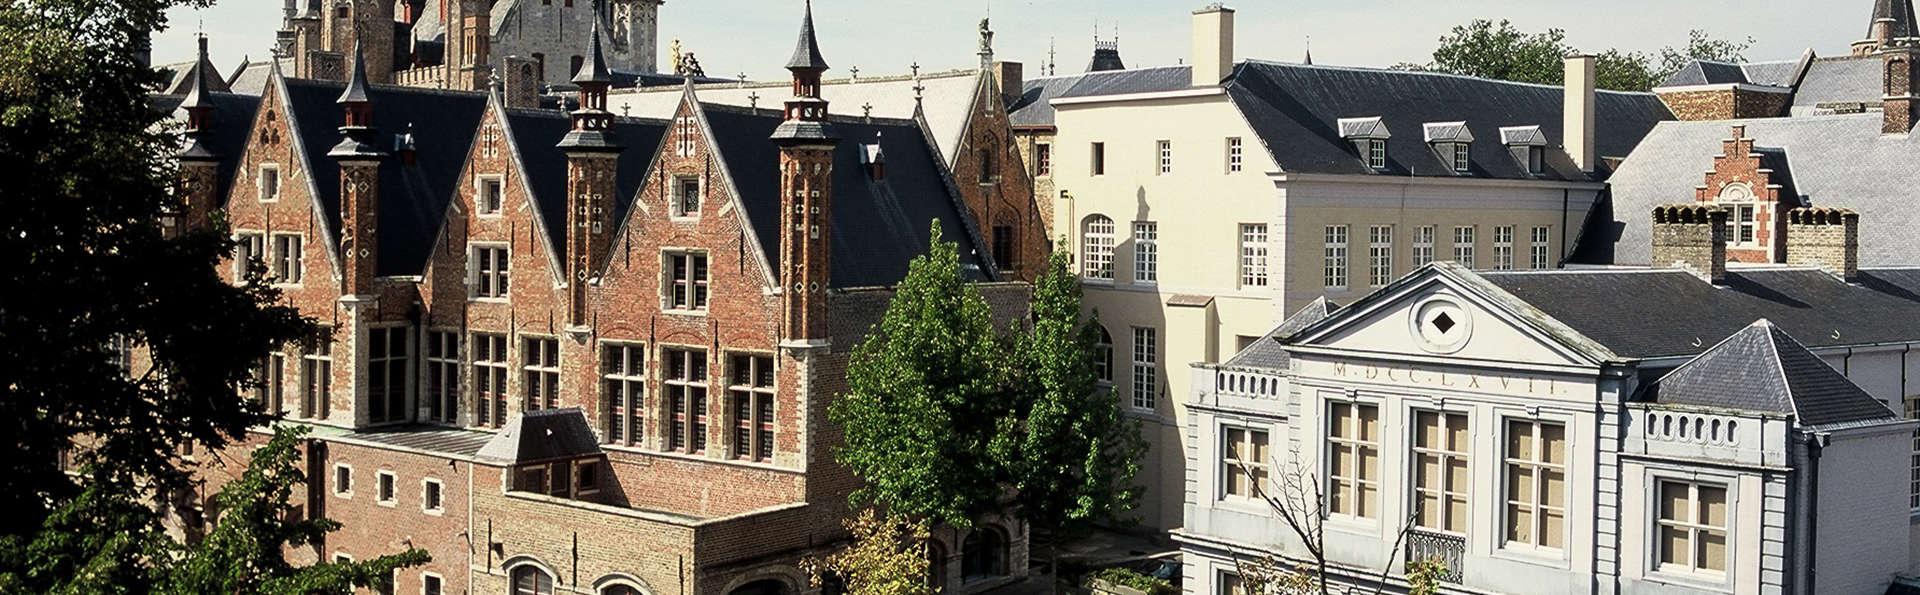 Hotel Die Swaene - EDIT_destination2.jpg